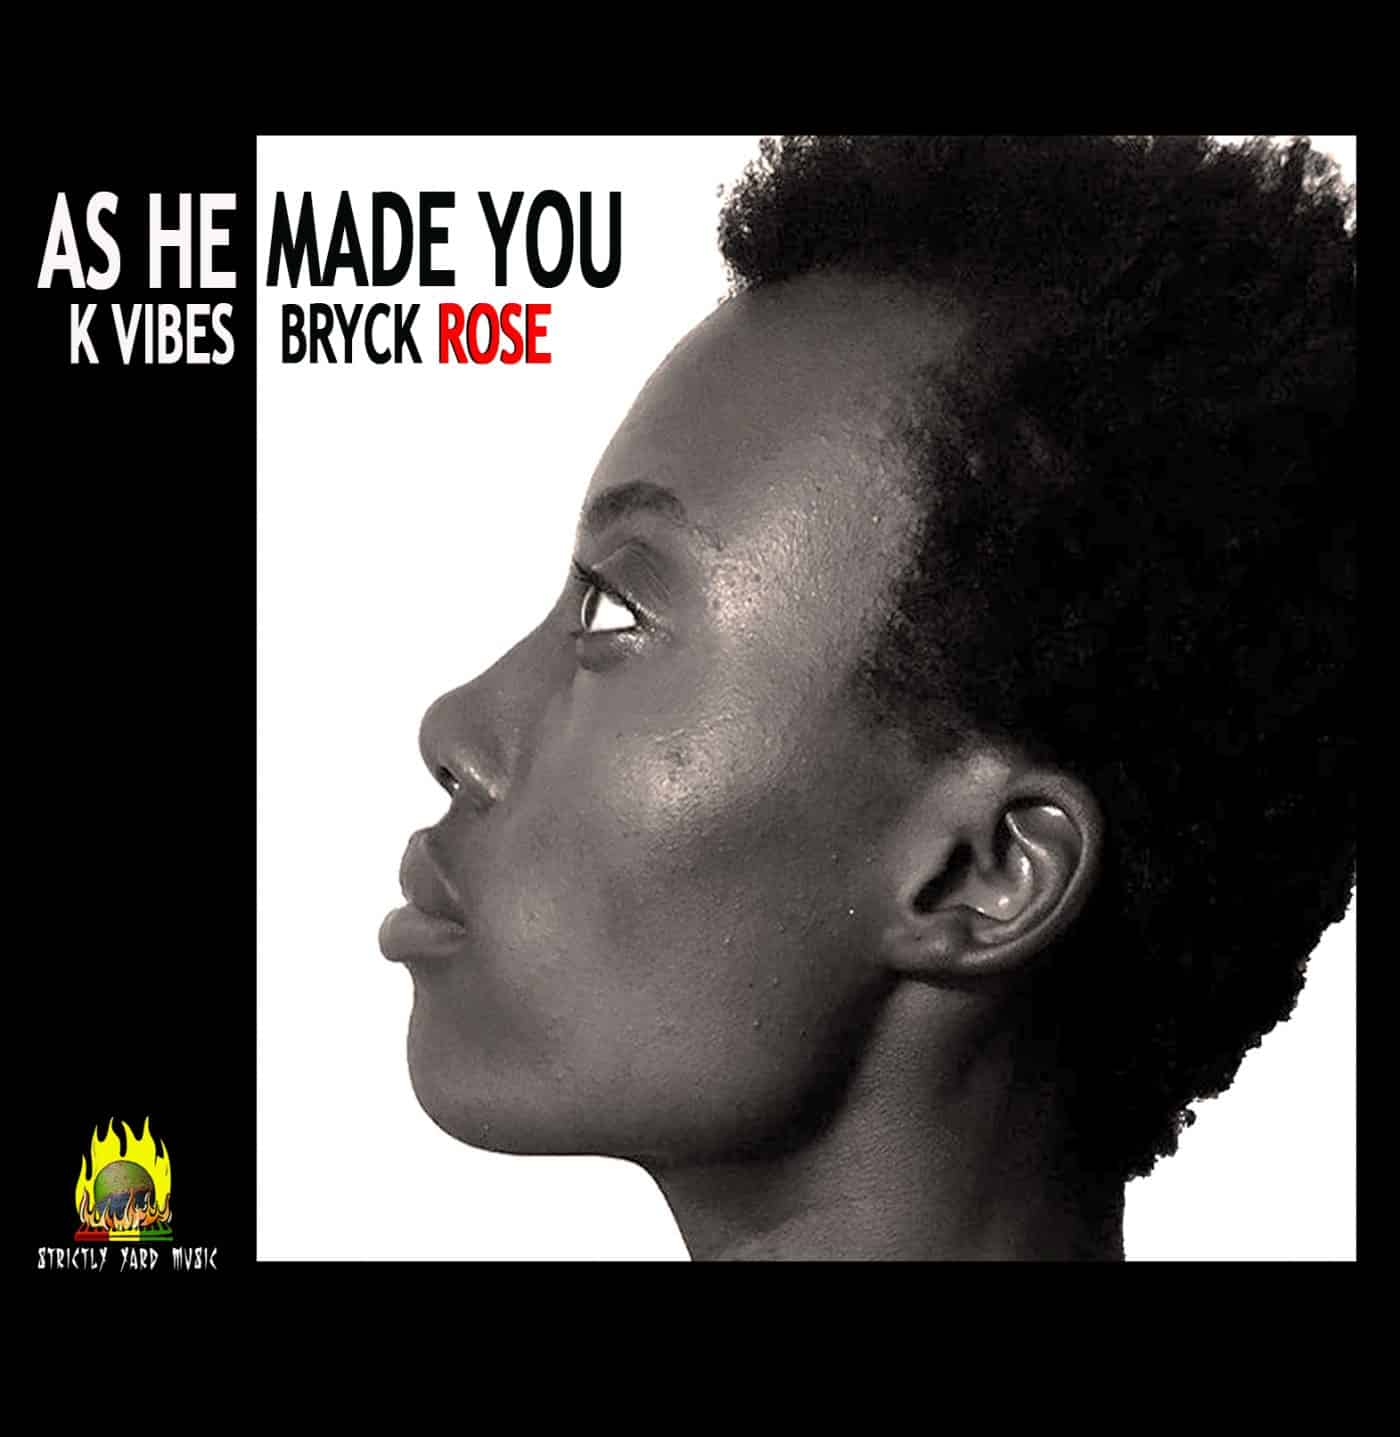 K Vibes aka Bryck Rose - As He Made You - Strictly Yard Music / VPAL